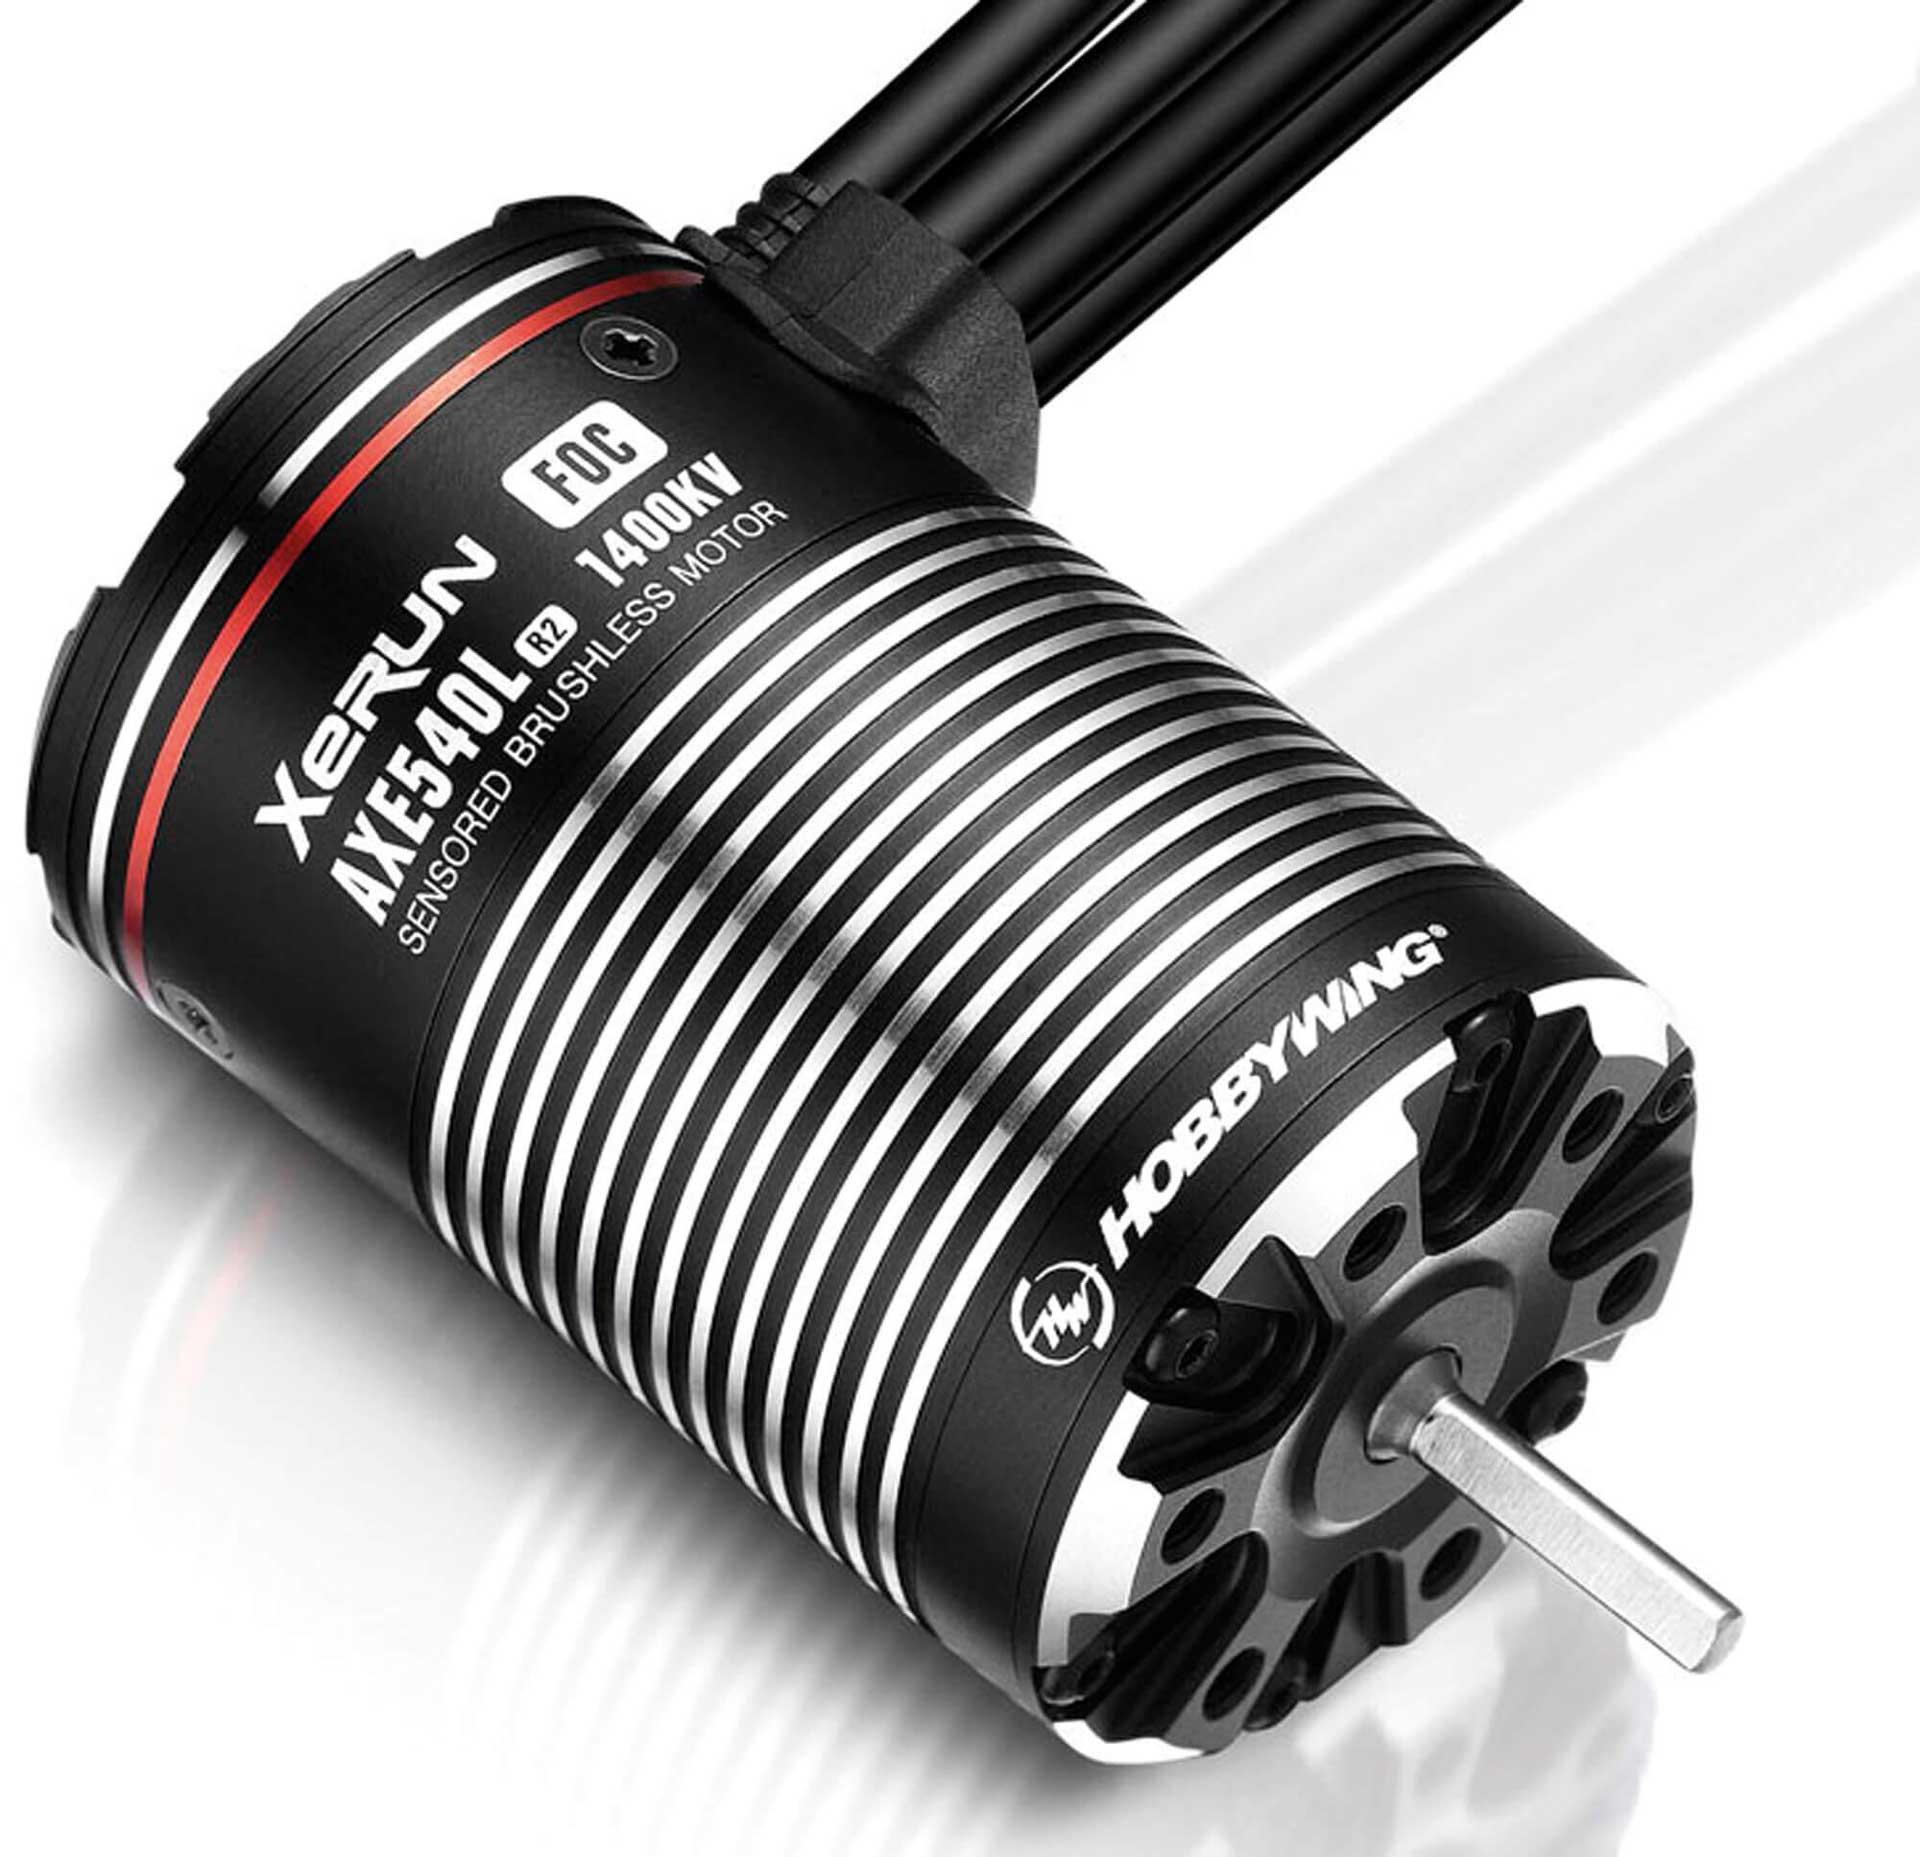 HOBBYWING Xerun AXE540L R2 1400KV Motor für Rock Crawler